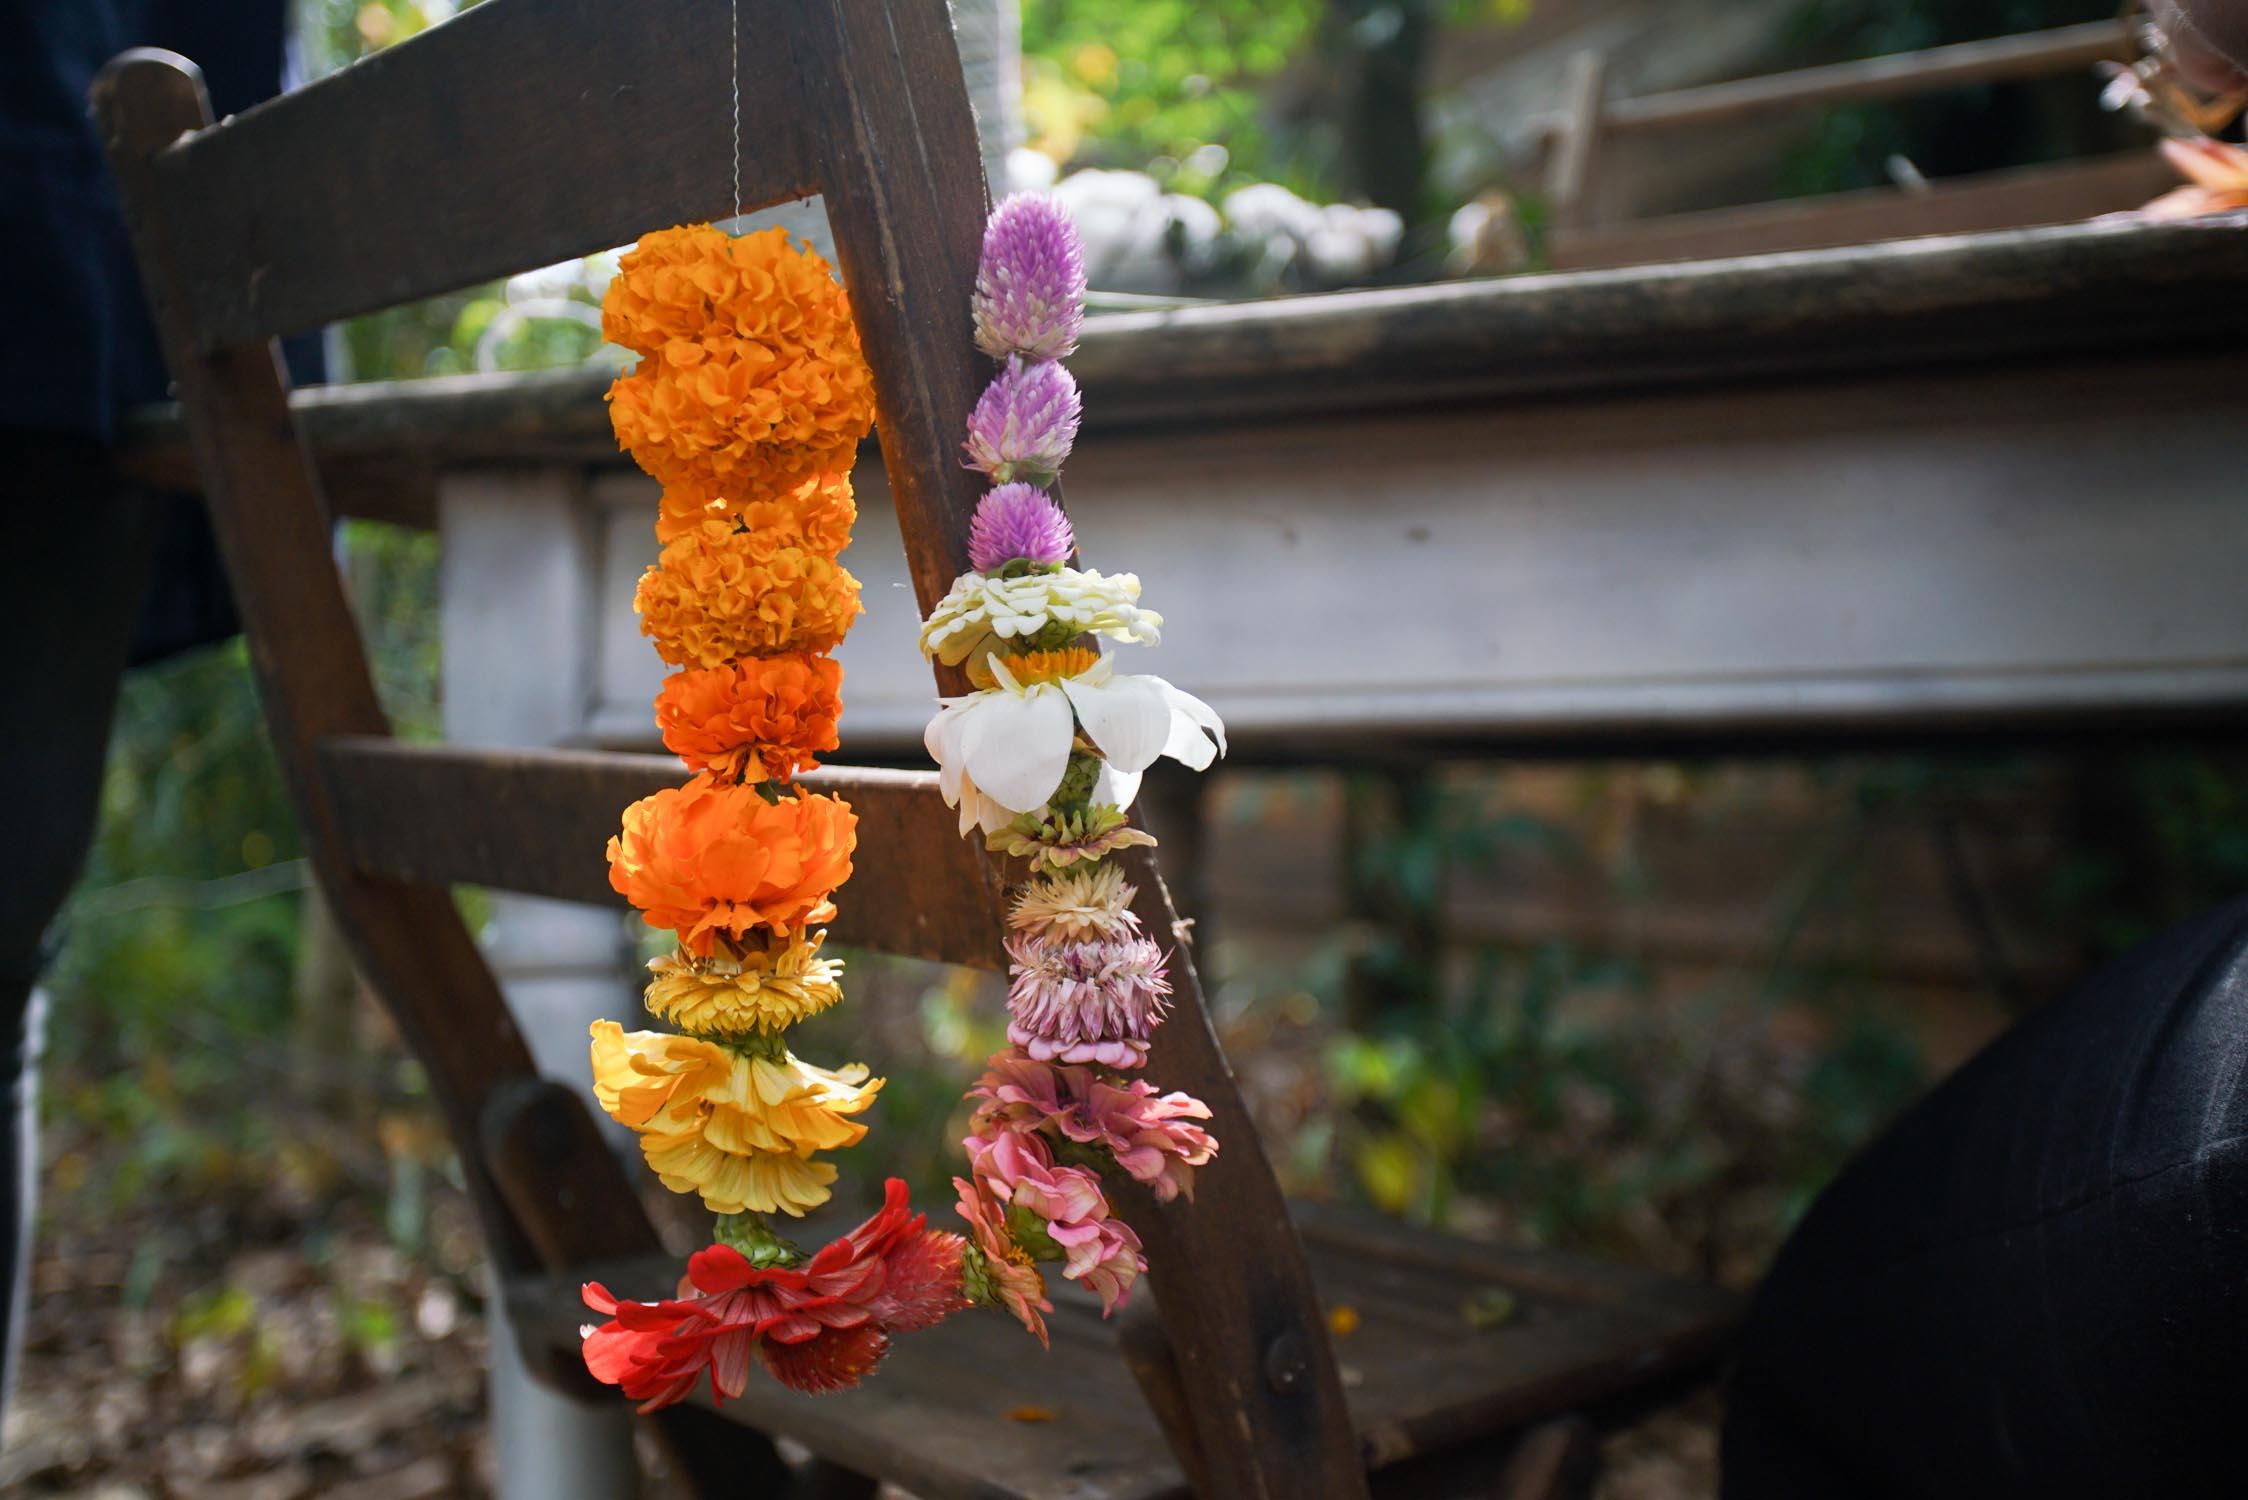 RA_3 porch farm 2016 flower social-2016101709082.jpg